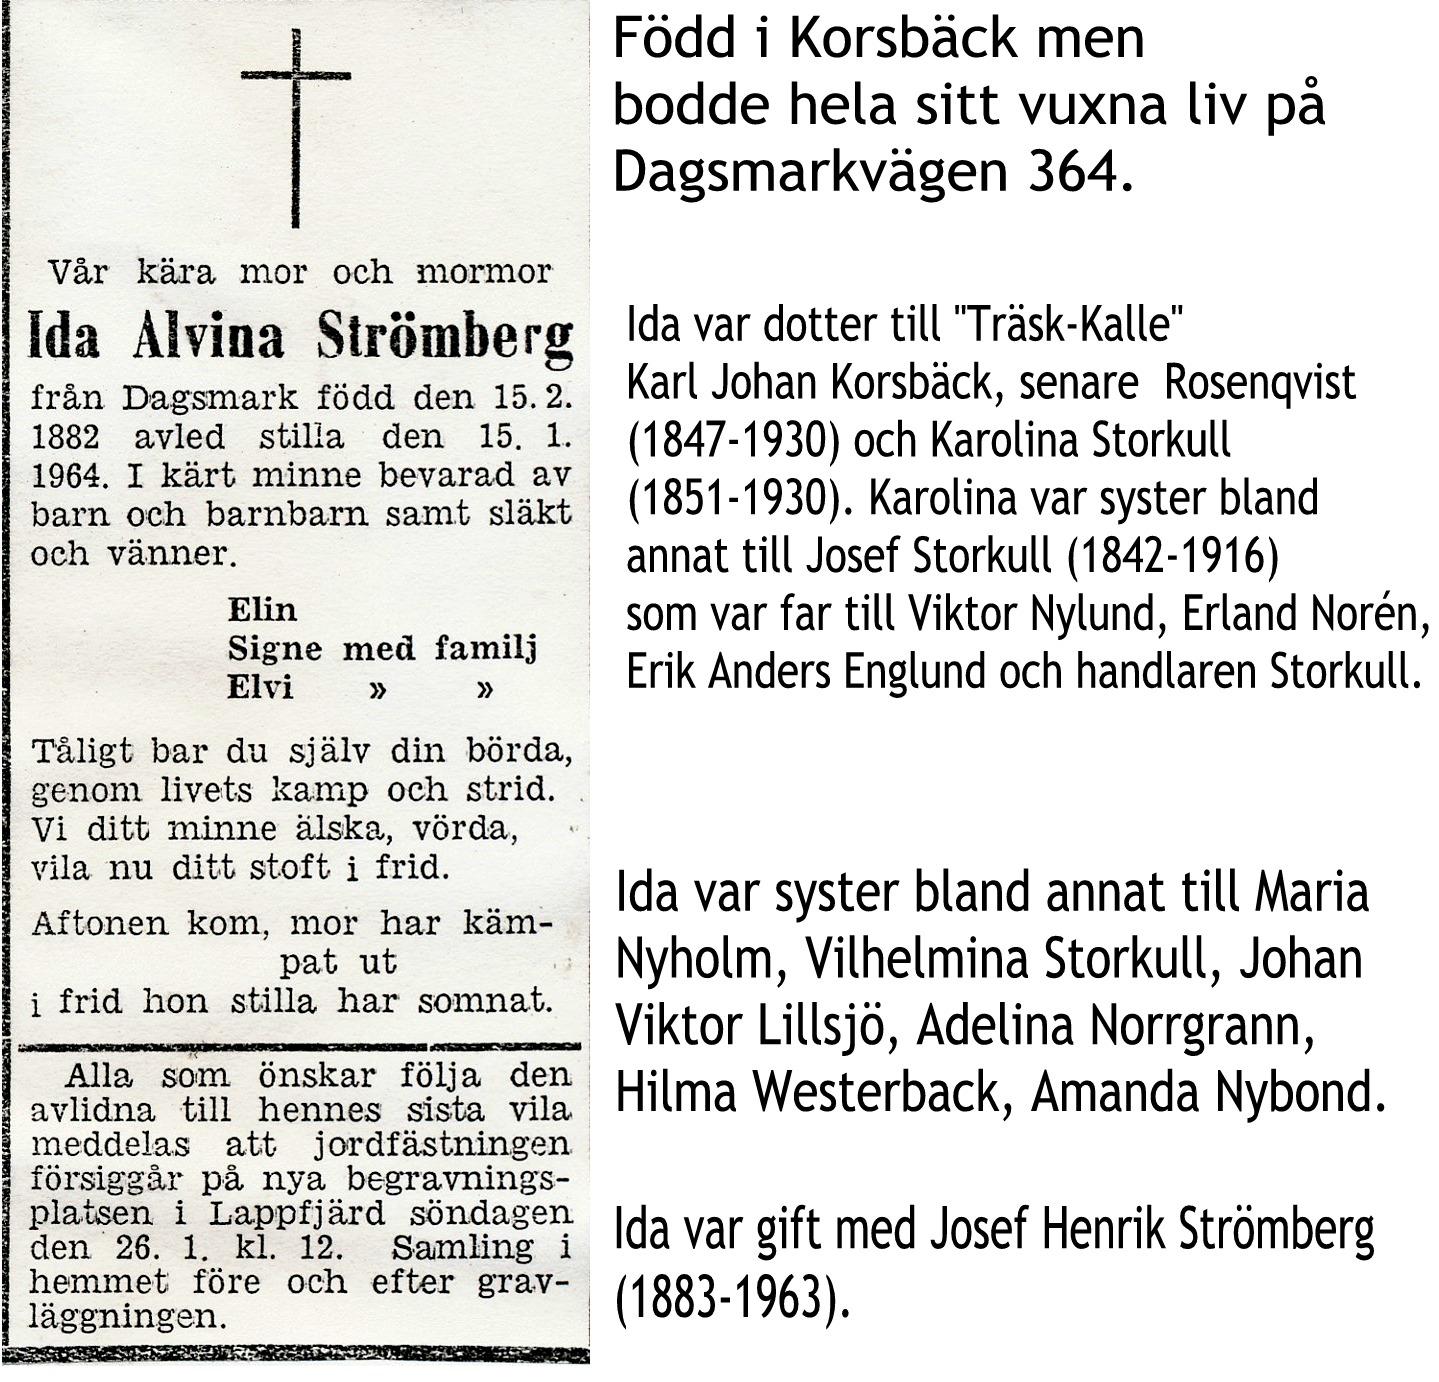 Strömberg Ida Alvina